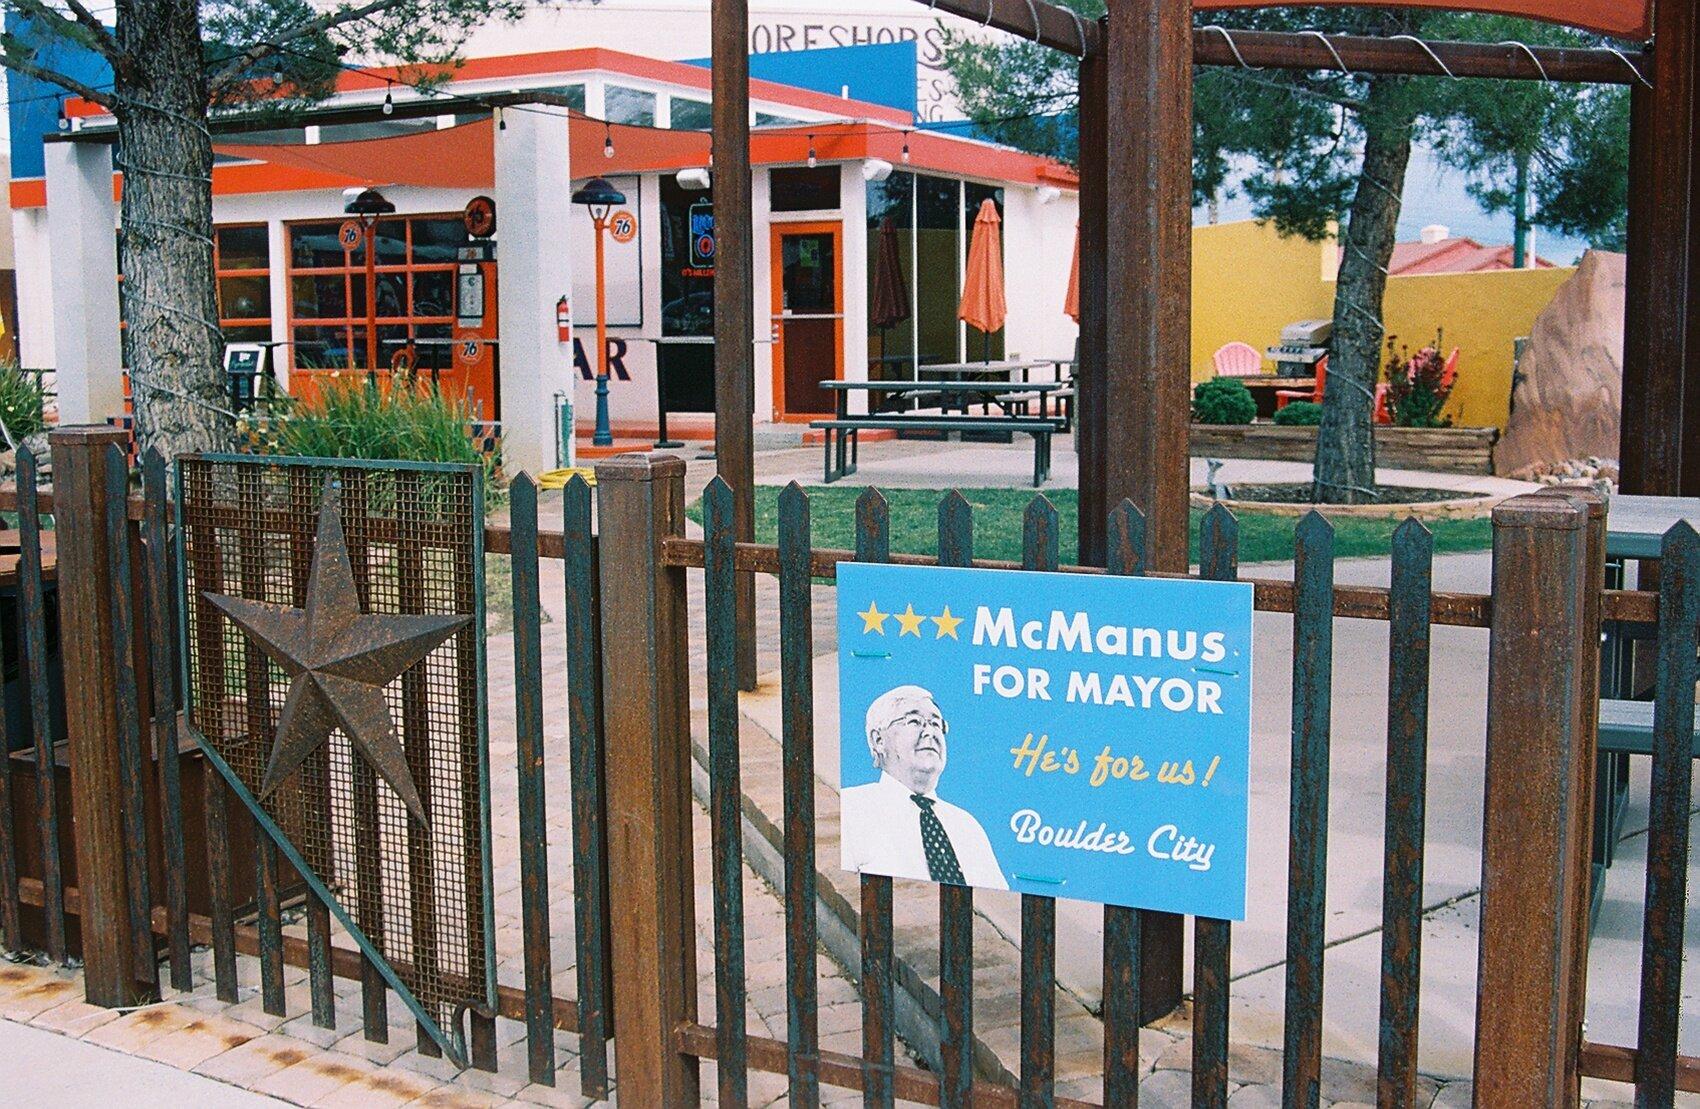 BC+McManus+for+mayor.jpeg